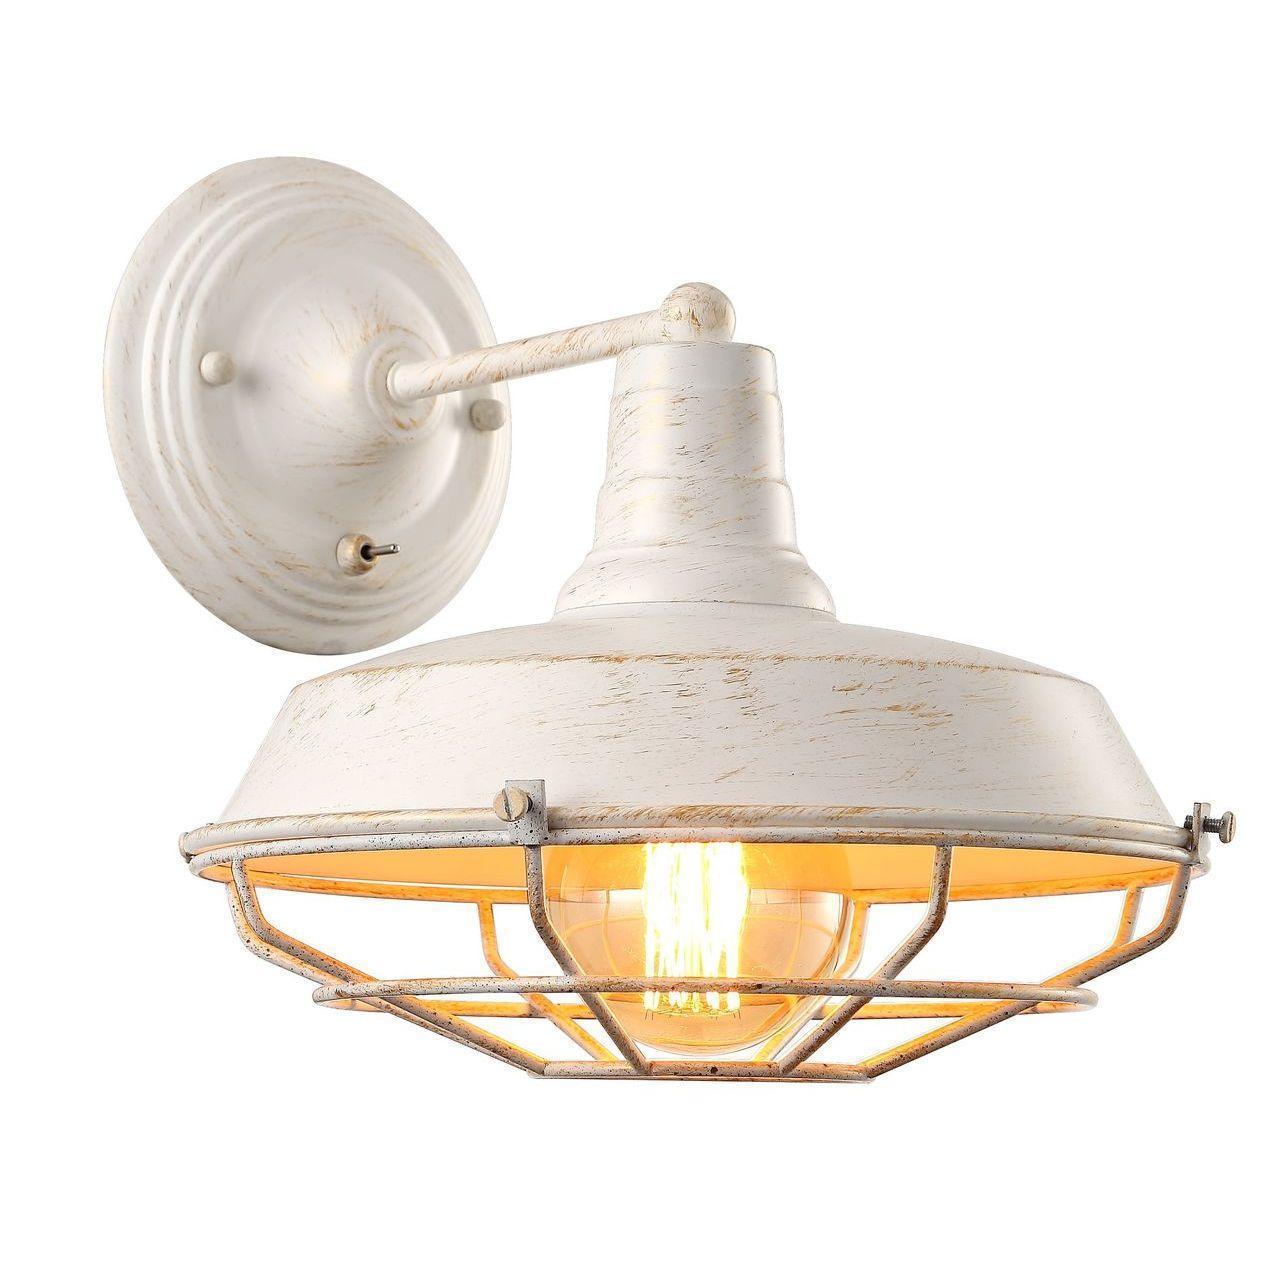 Бра Arte Lamp Ferrico A9183AP-1WG бра arte lamp ferrico a9183ap 1wg